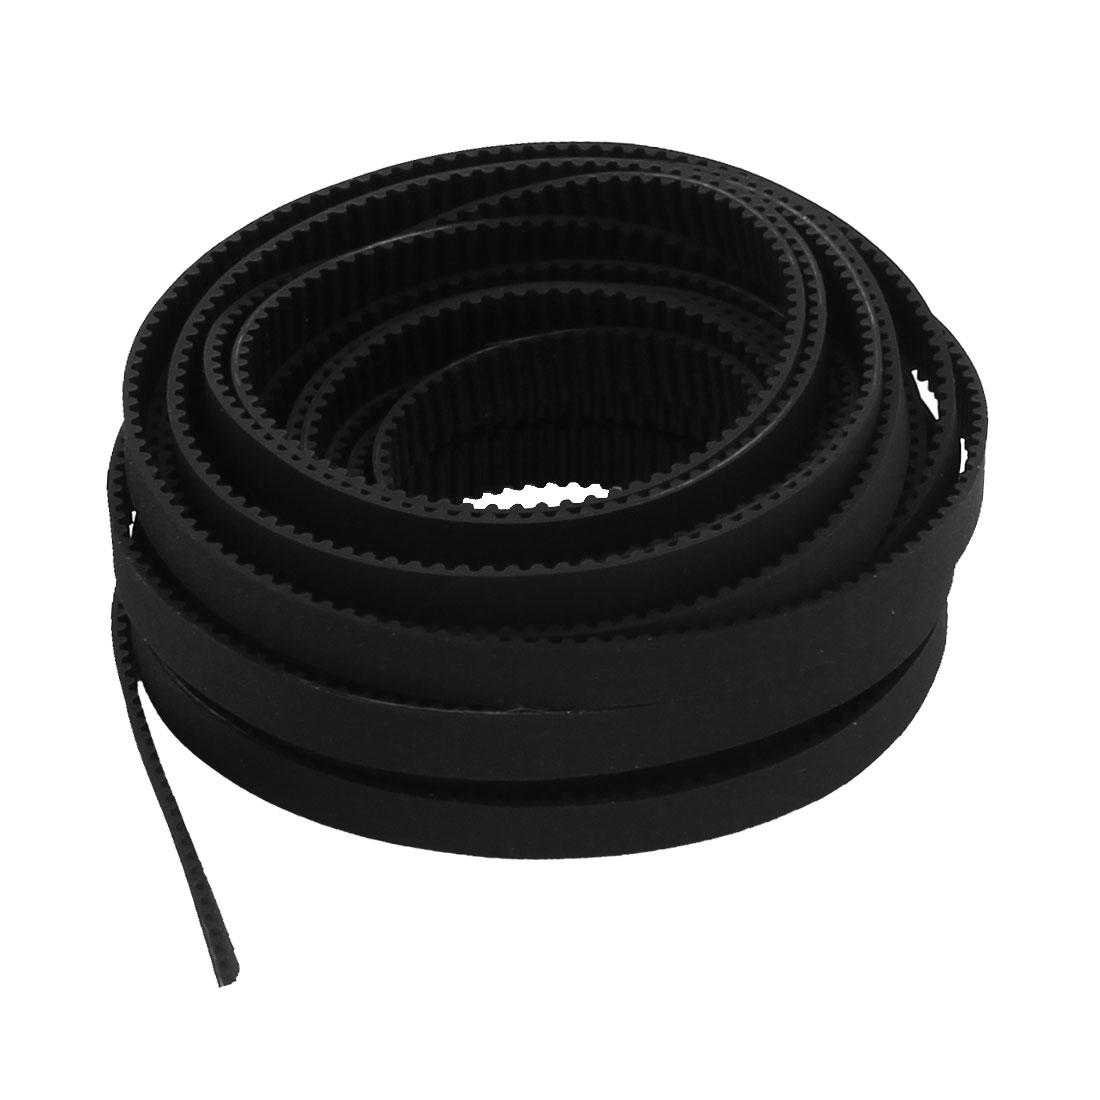 2GT 6mm Wide 2mm Pitch Open Loop Rubber Timing Belt Black 5M for 3D Printer